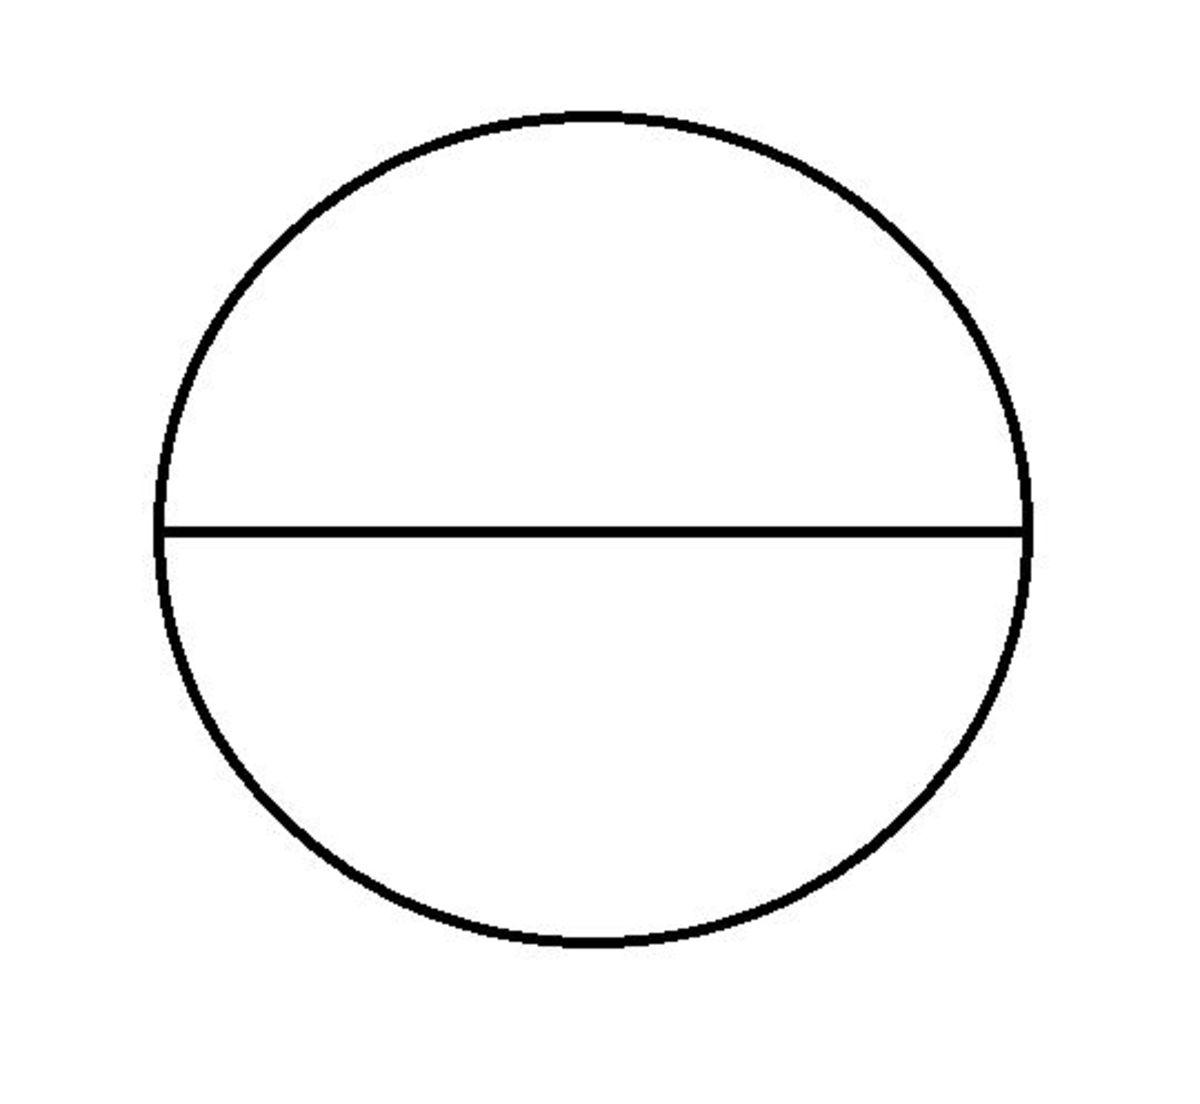 Salt symbol.